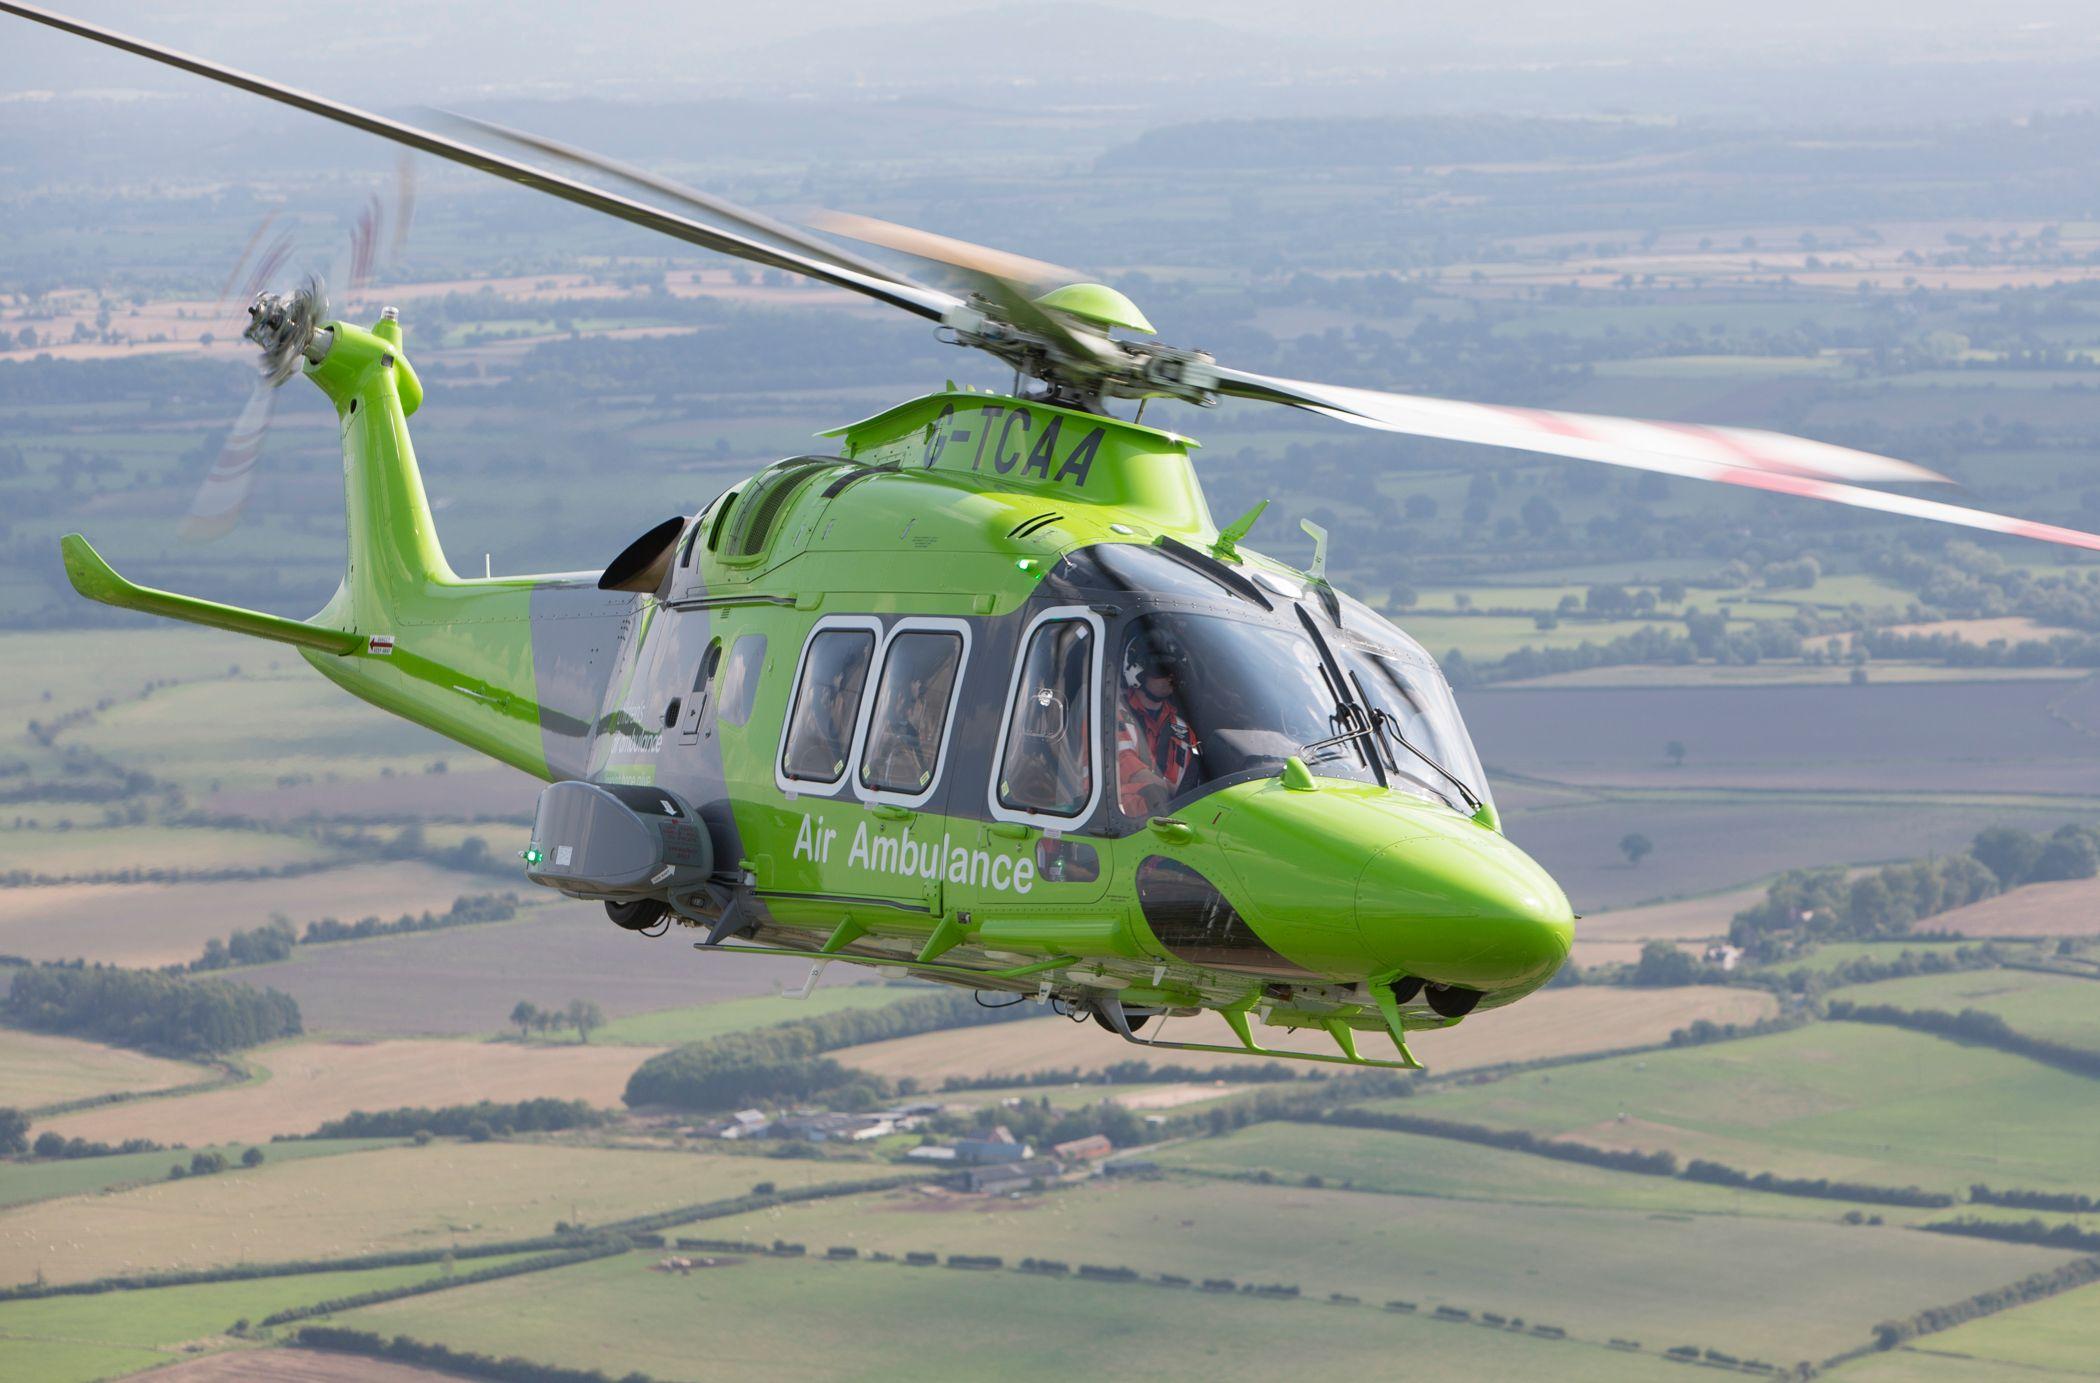 The Air Ambulance Service Trading LTD